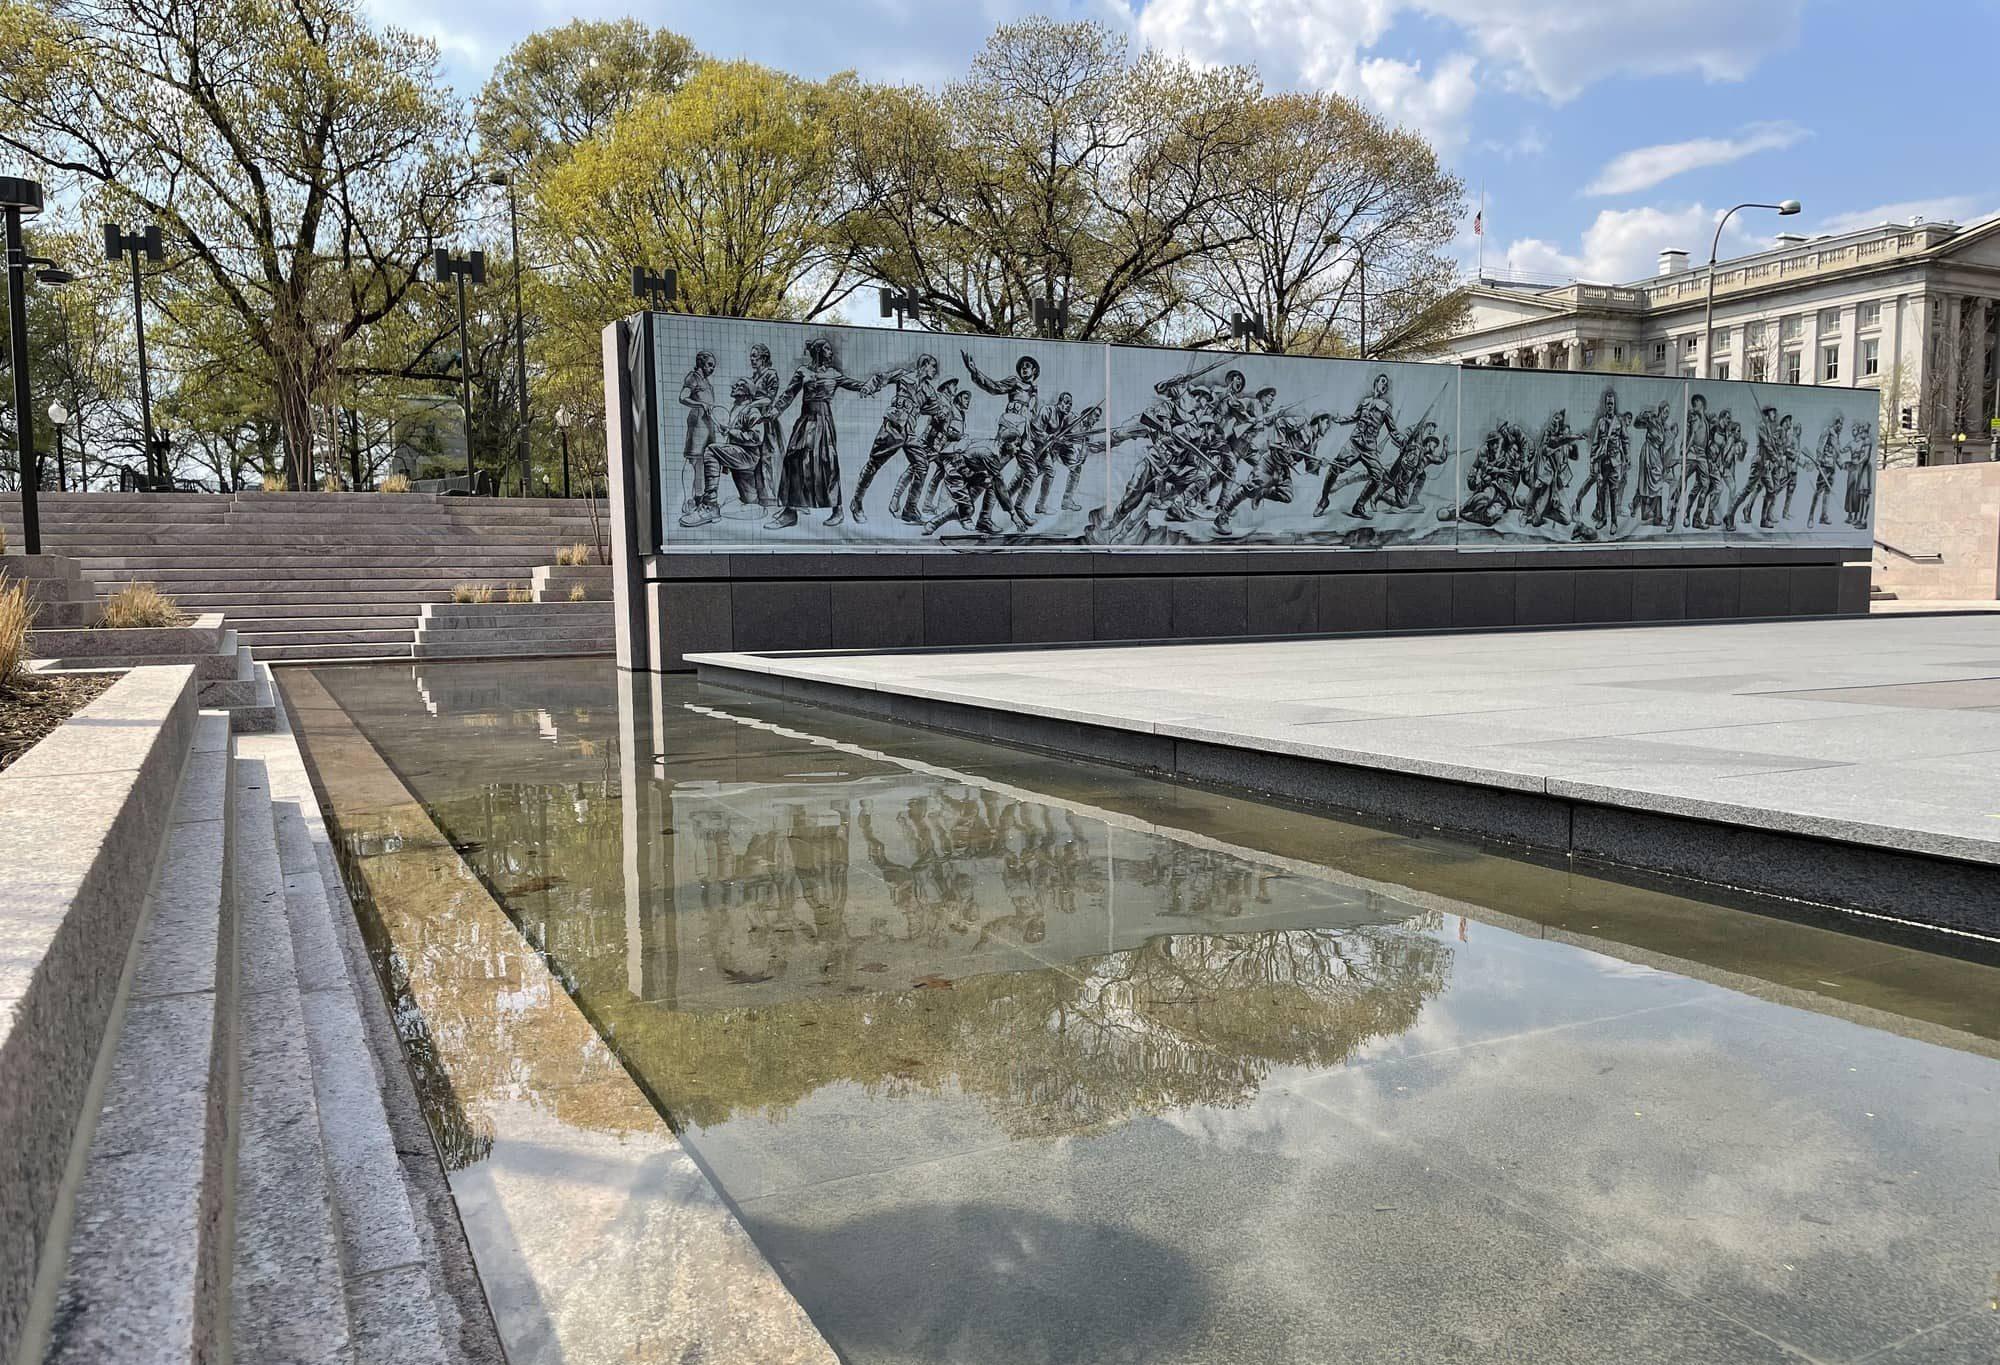 Vietnam Veterans Memorial Wall in Washington, DC